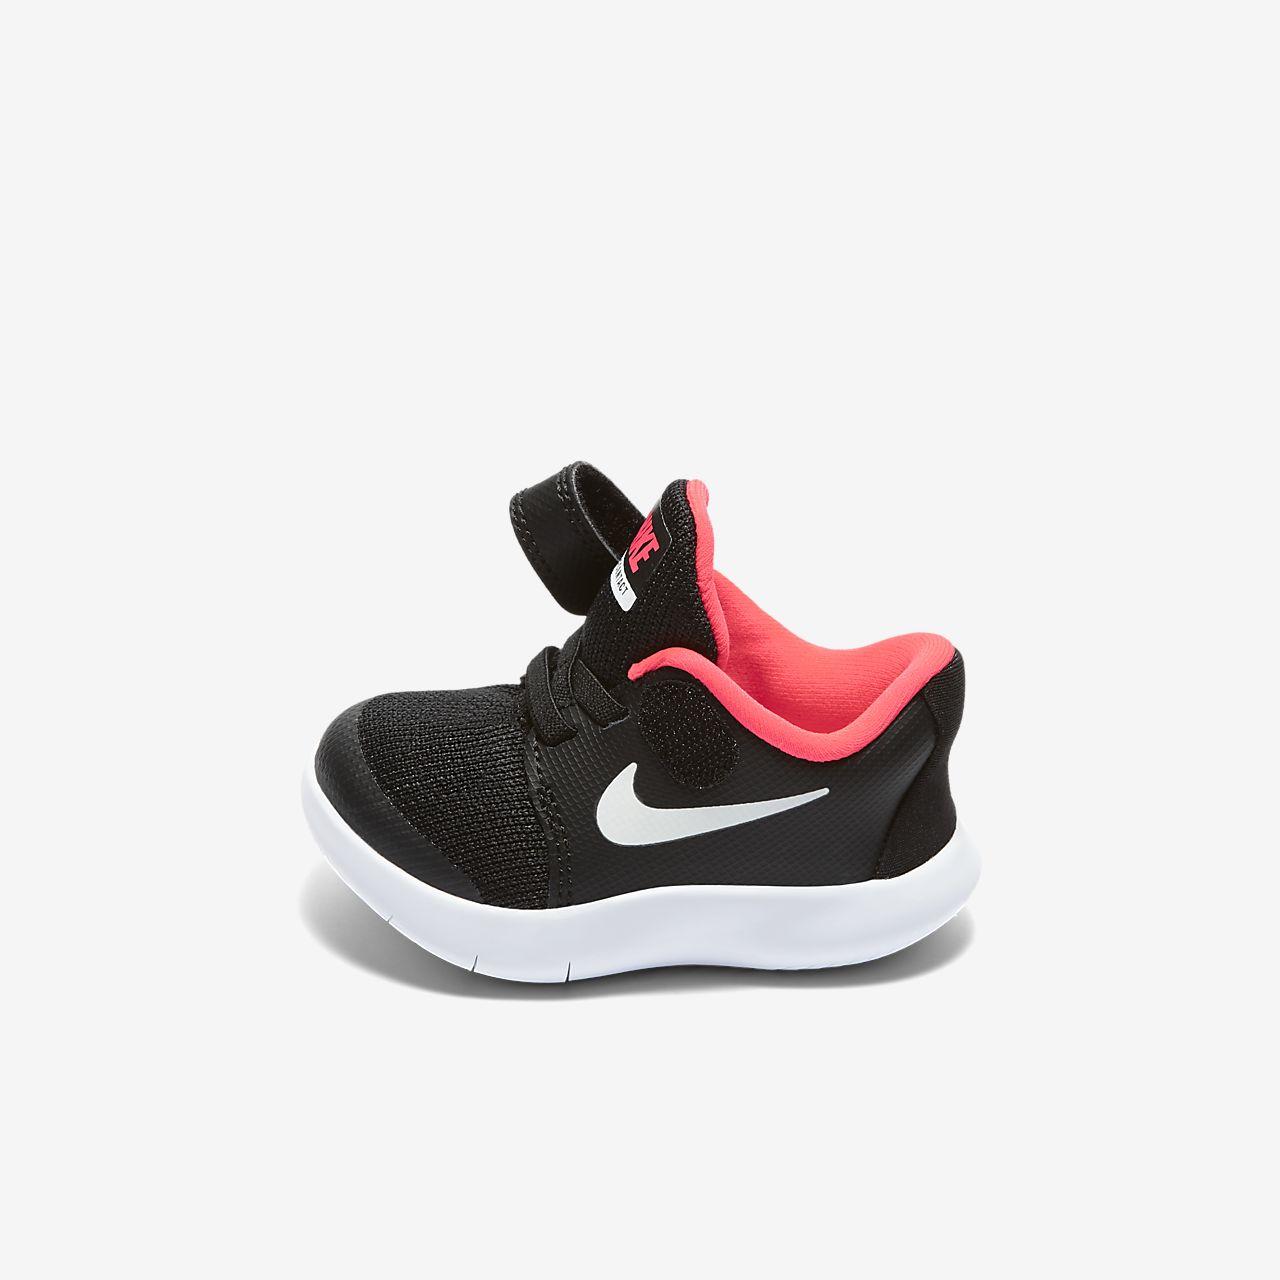 ace260a220d6 Nike Flex Contact 2 Baby  amp  Toddler Shoe. Nike.com GB